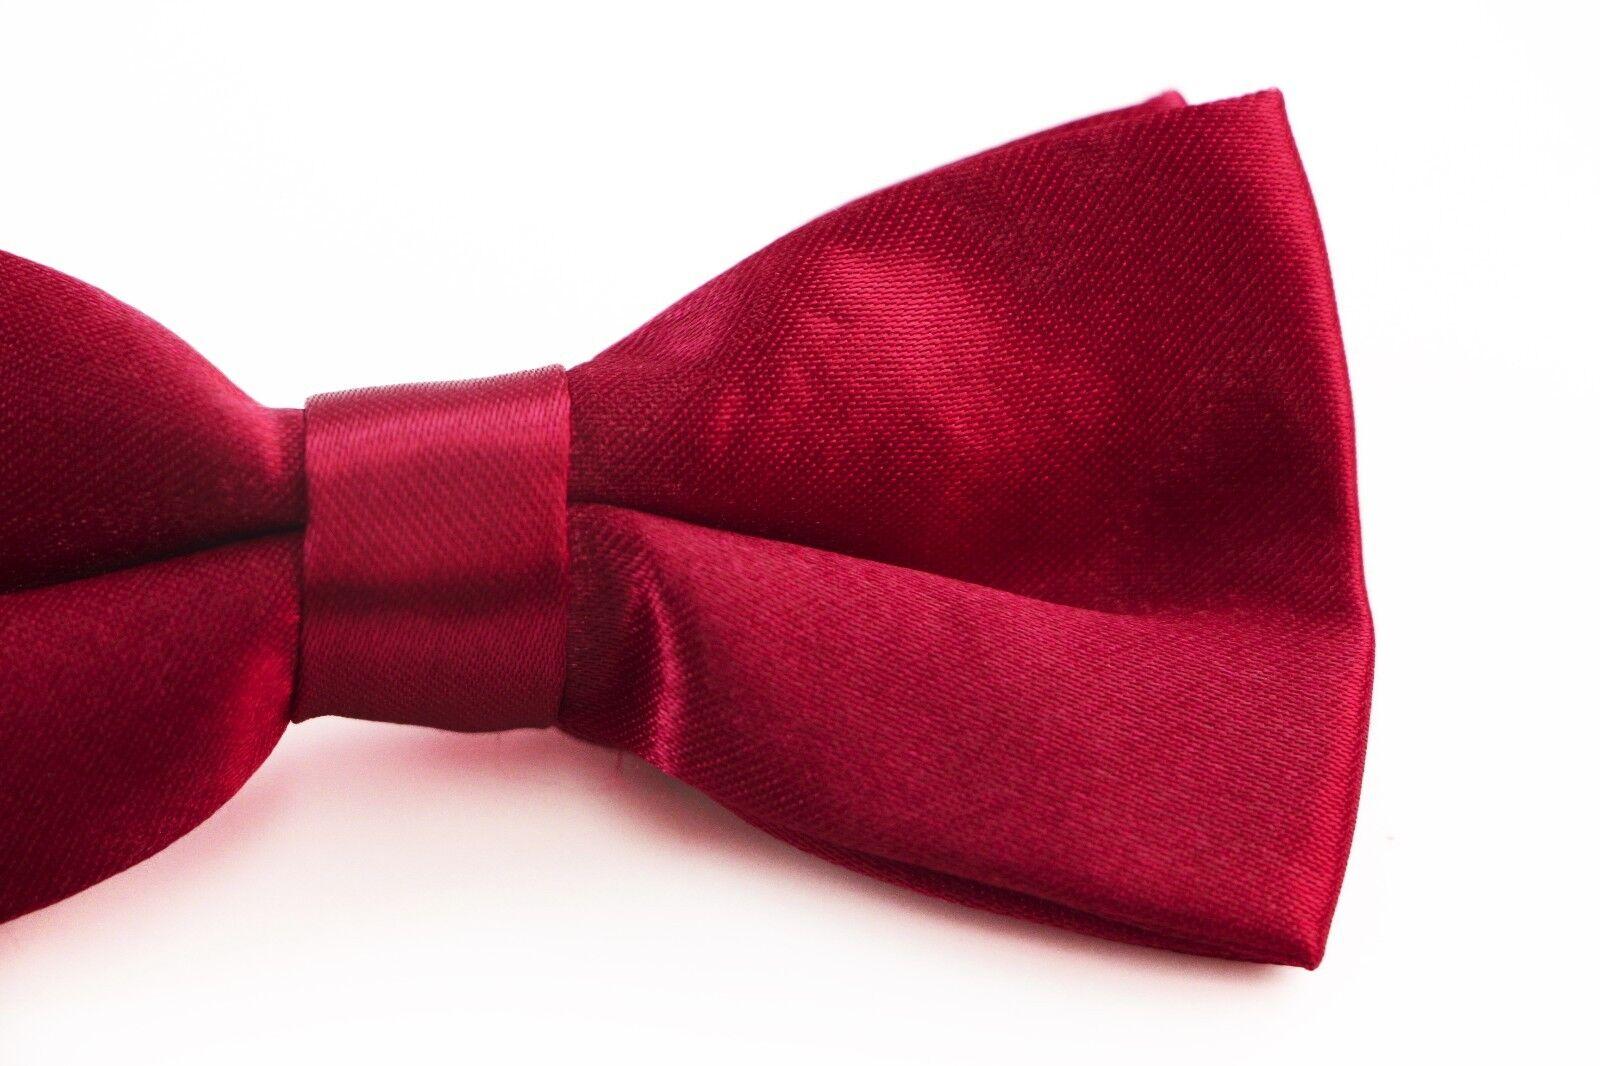 BOYS MAROON RED BOW TIE Wedding Little Baby Toddler Kids Adjustable Pretied